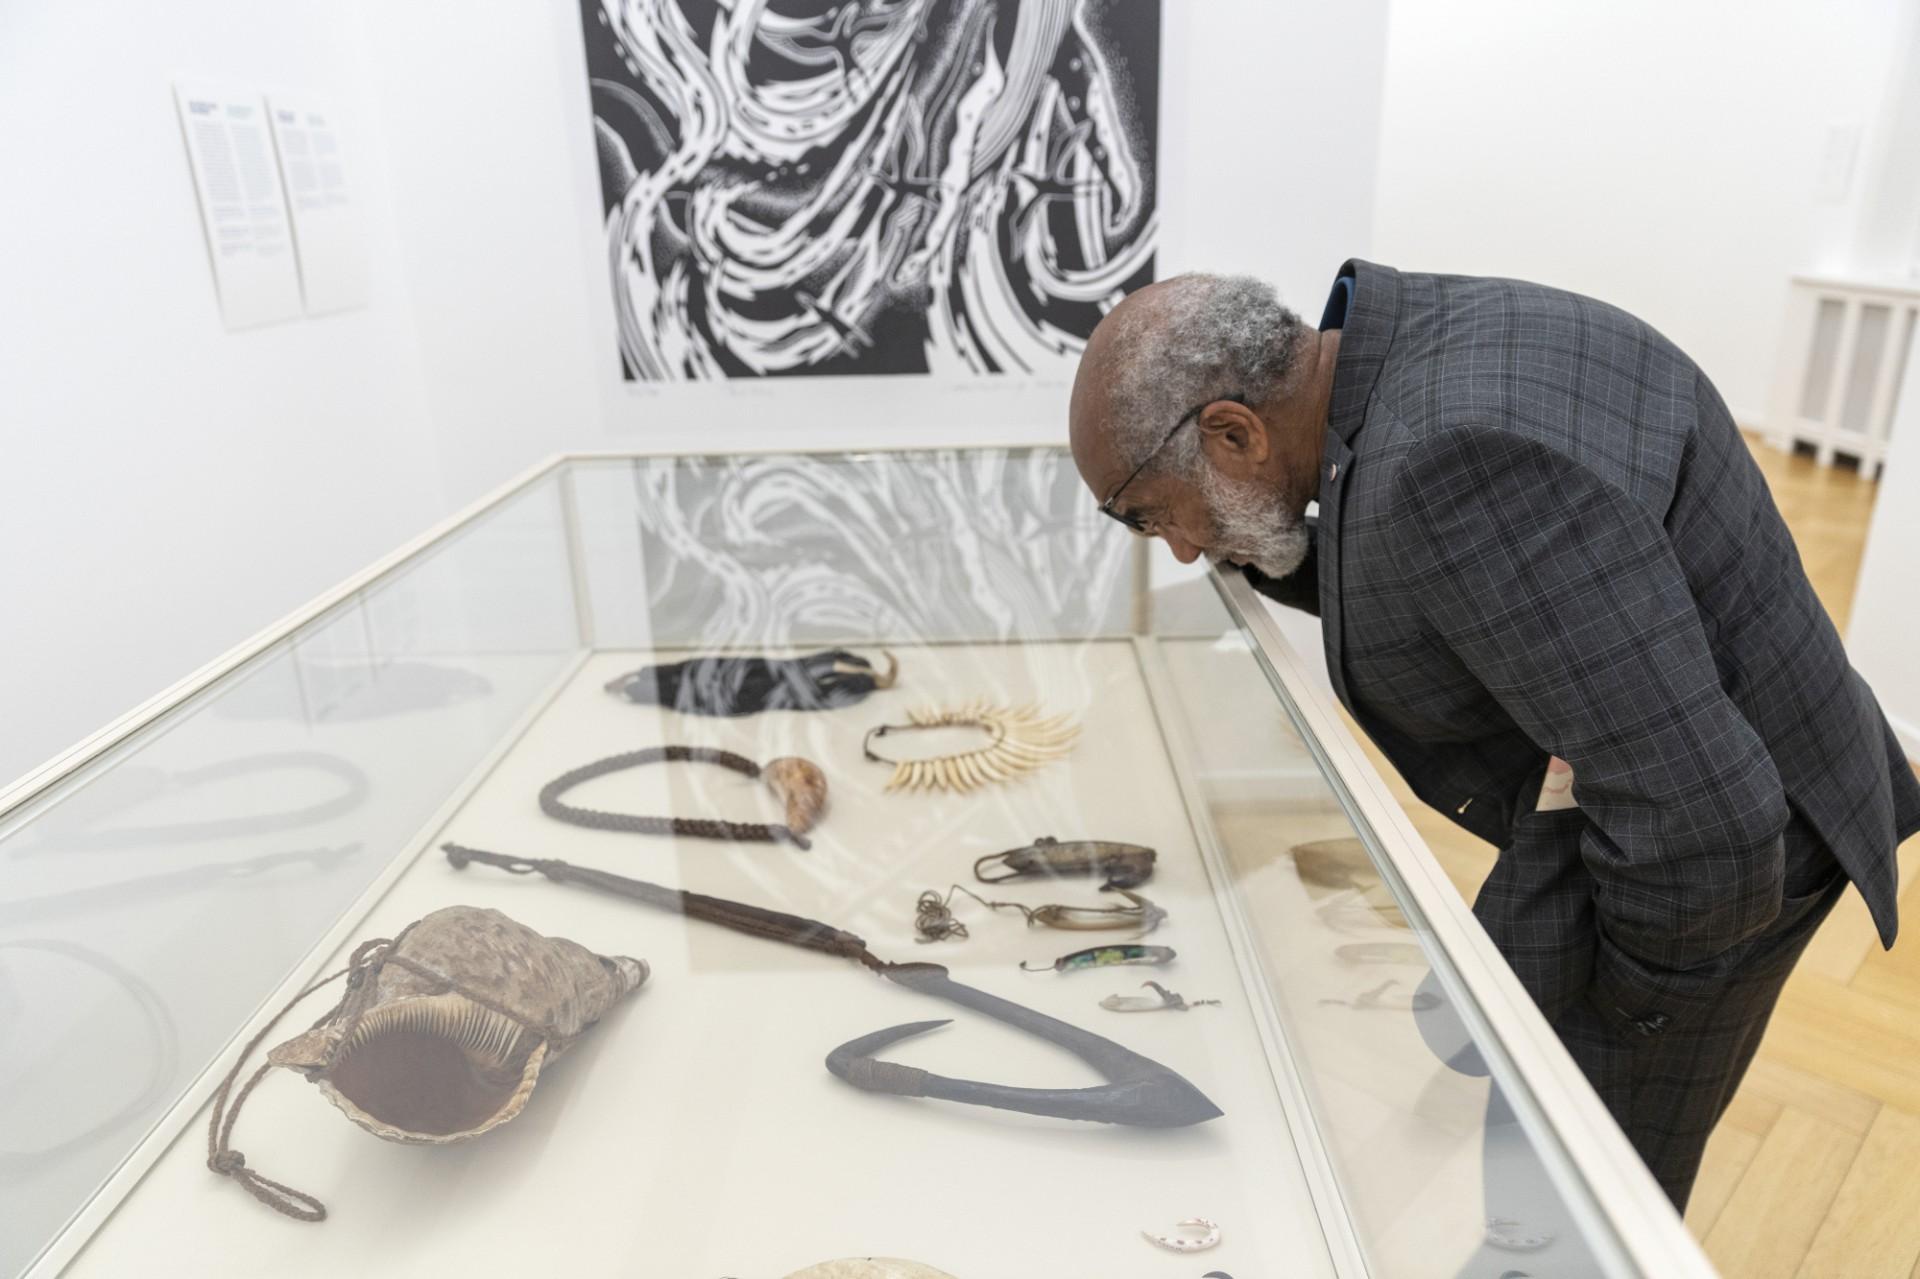 Ausstellung, Museum, Mann, Besucher